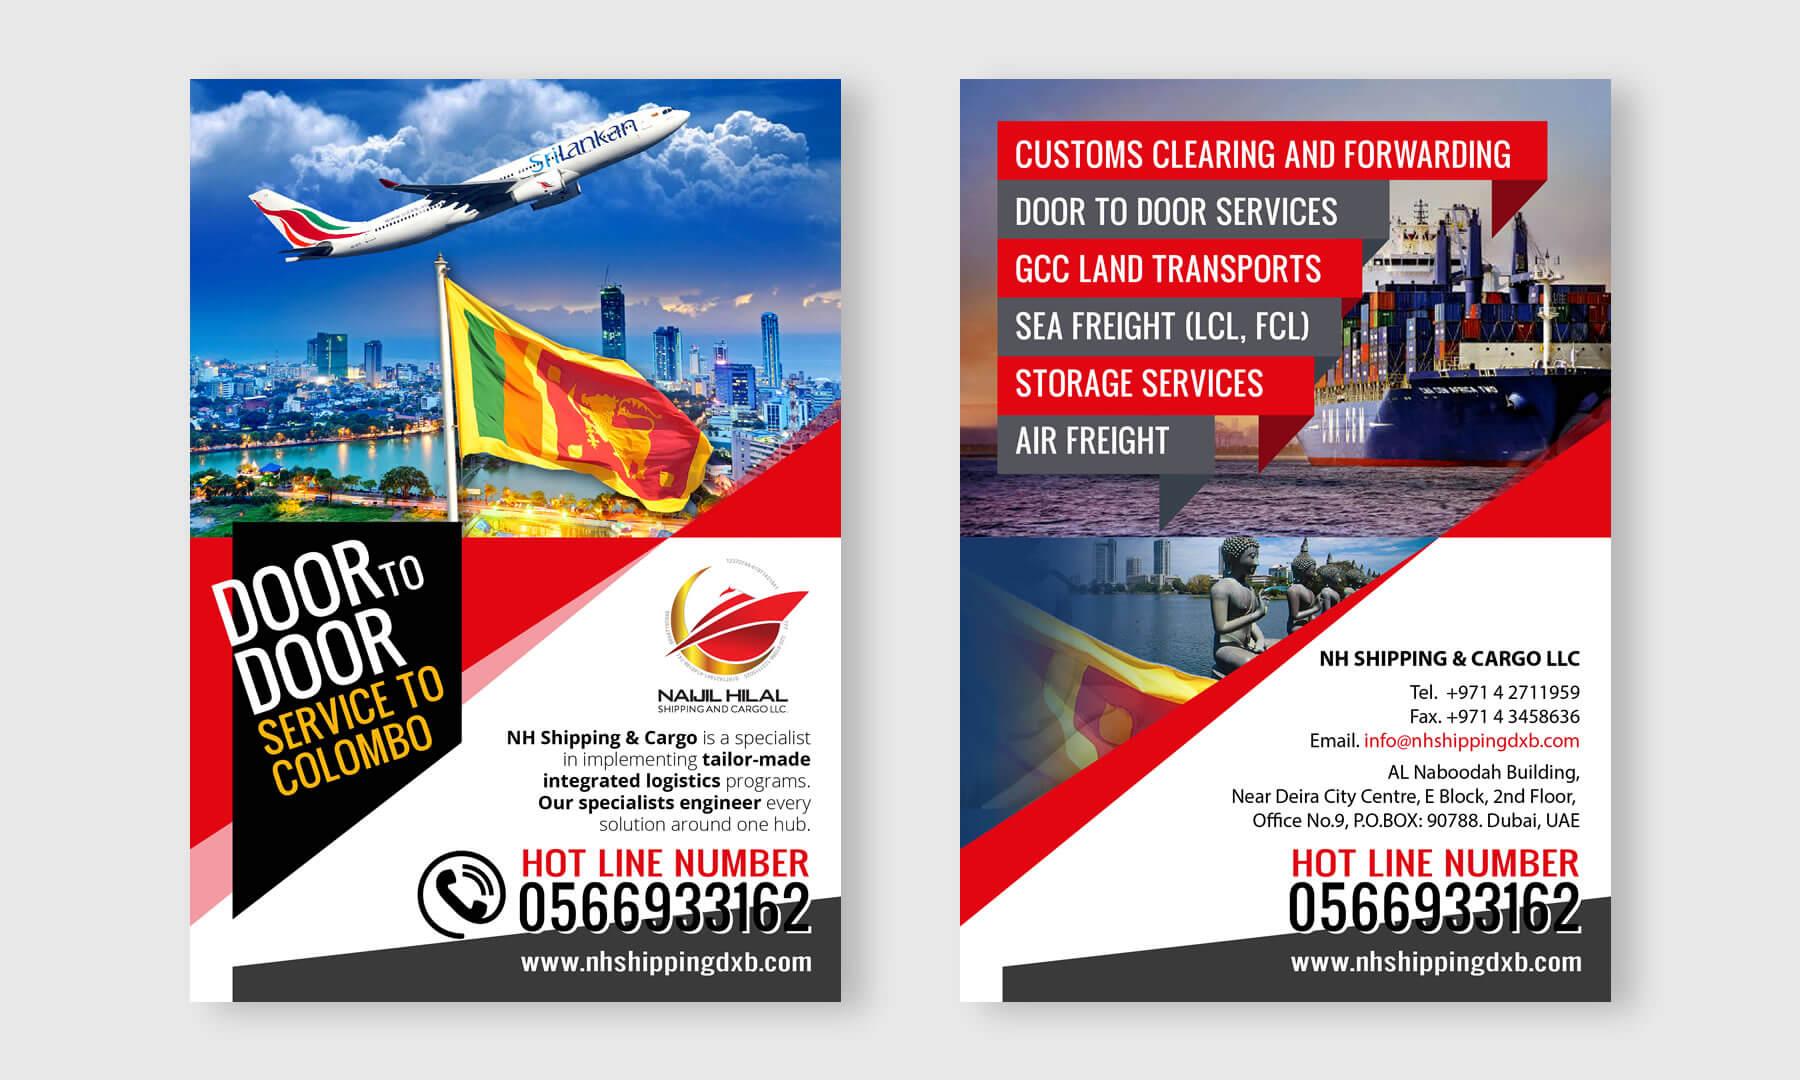 designs by Kerala freelance designer